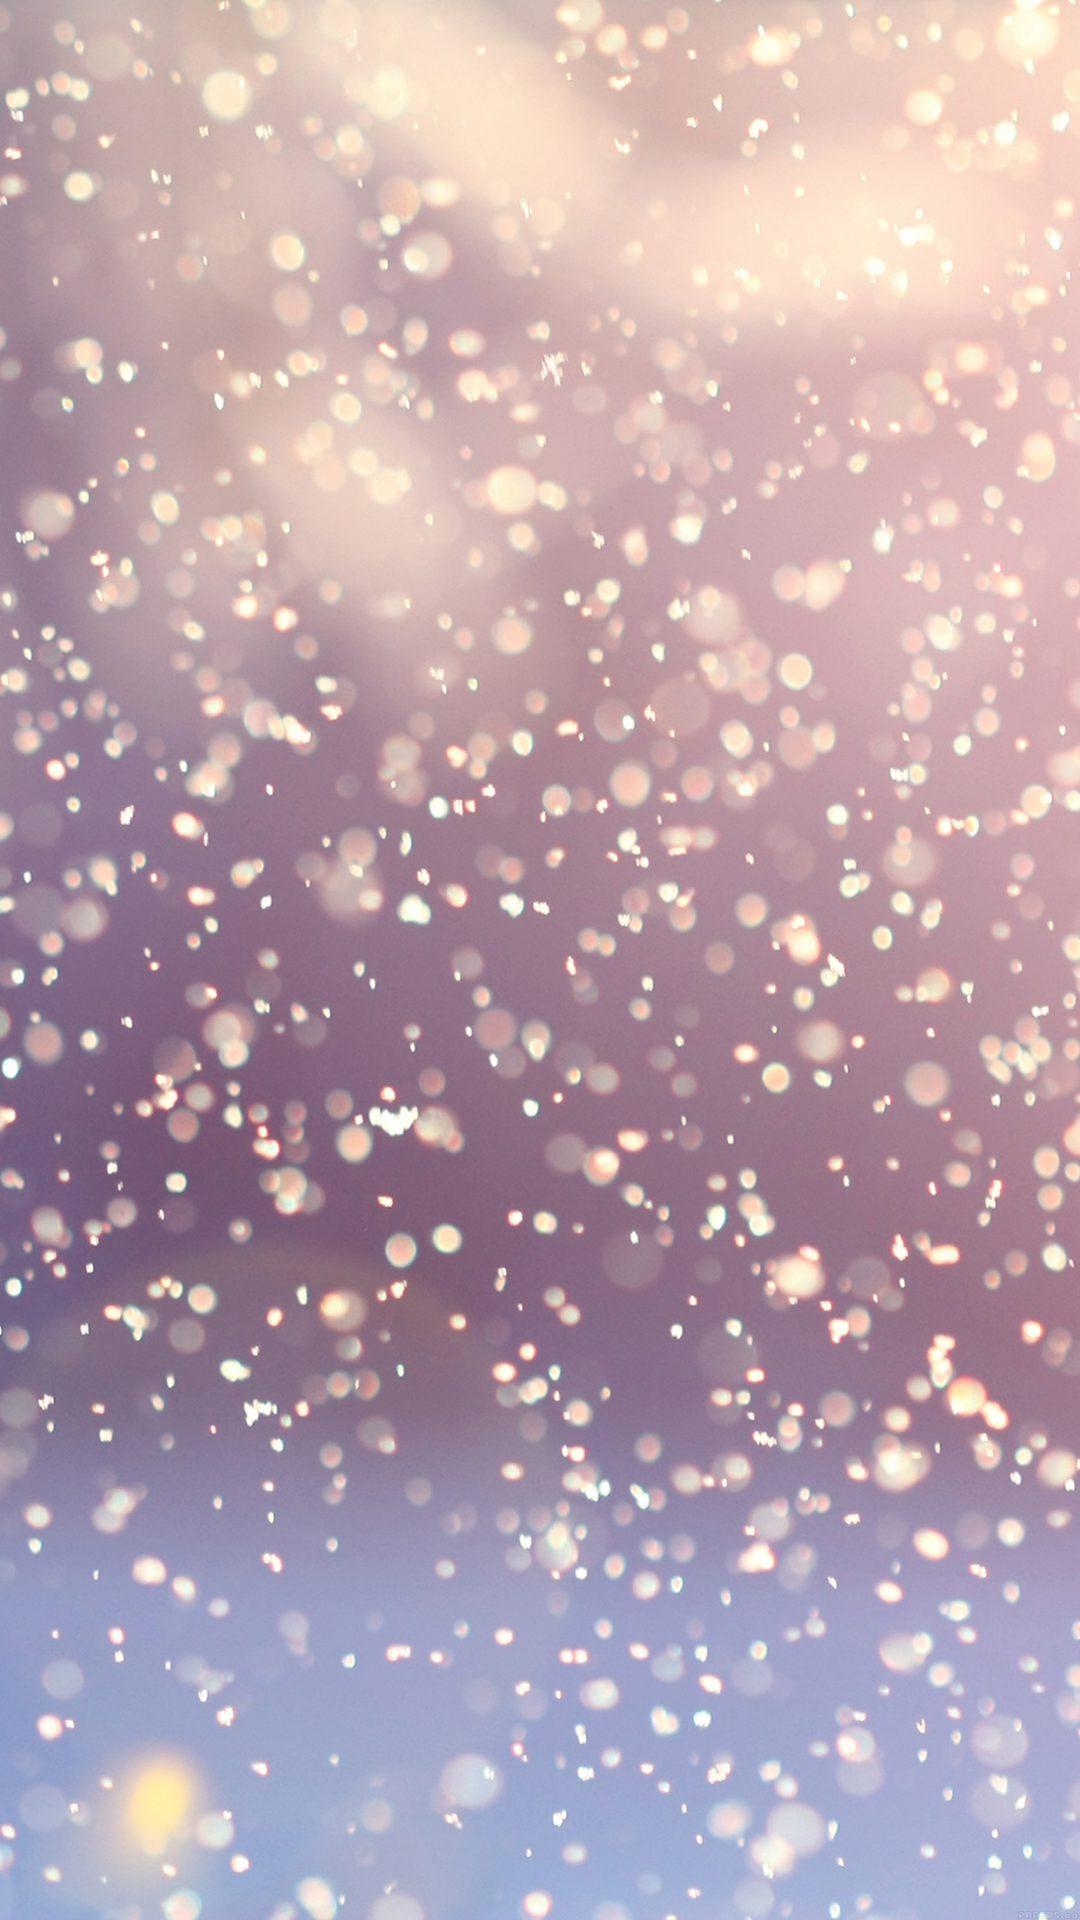 Bokeh Snow Flare Water Splash Pattern